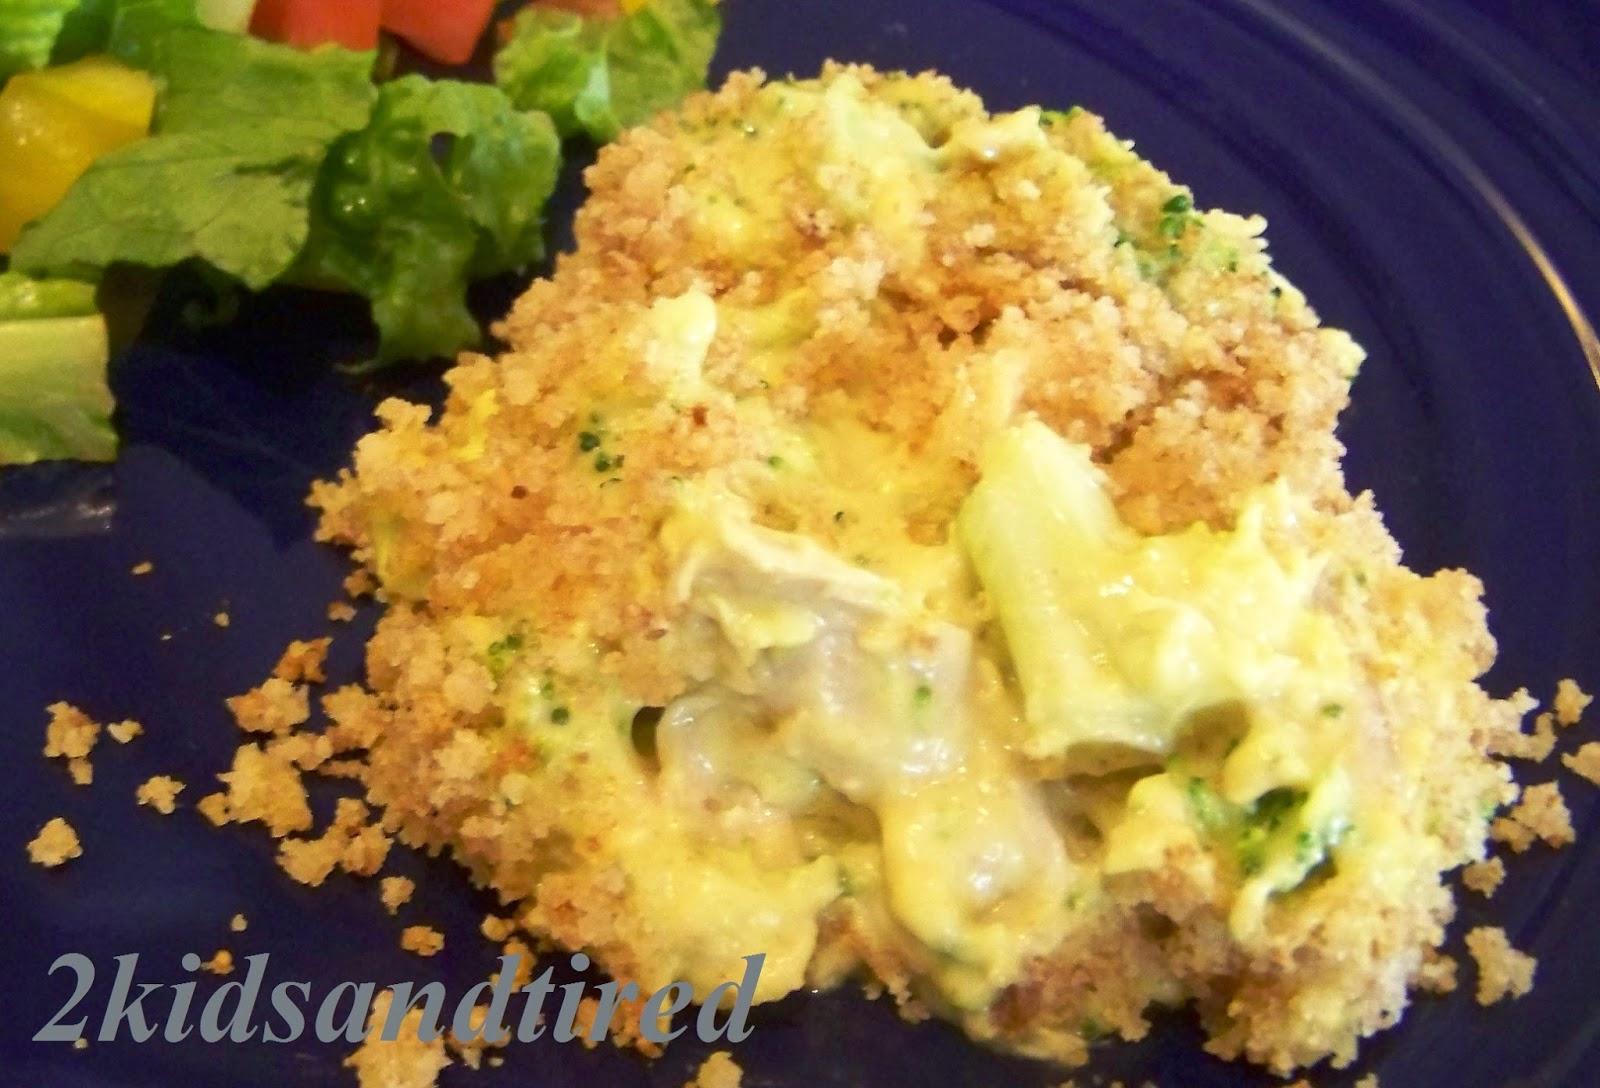 Cauliflower Broccoli Casserole Food Network